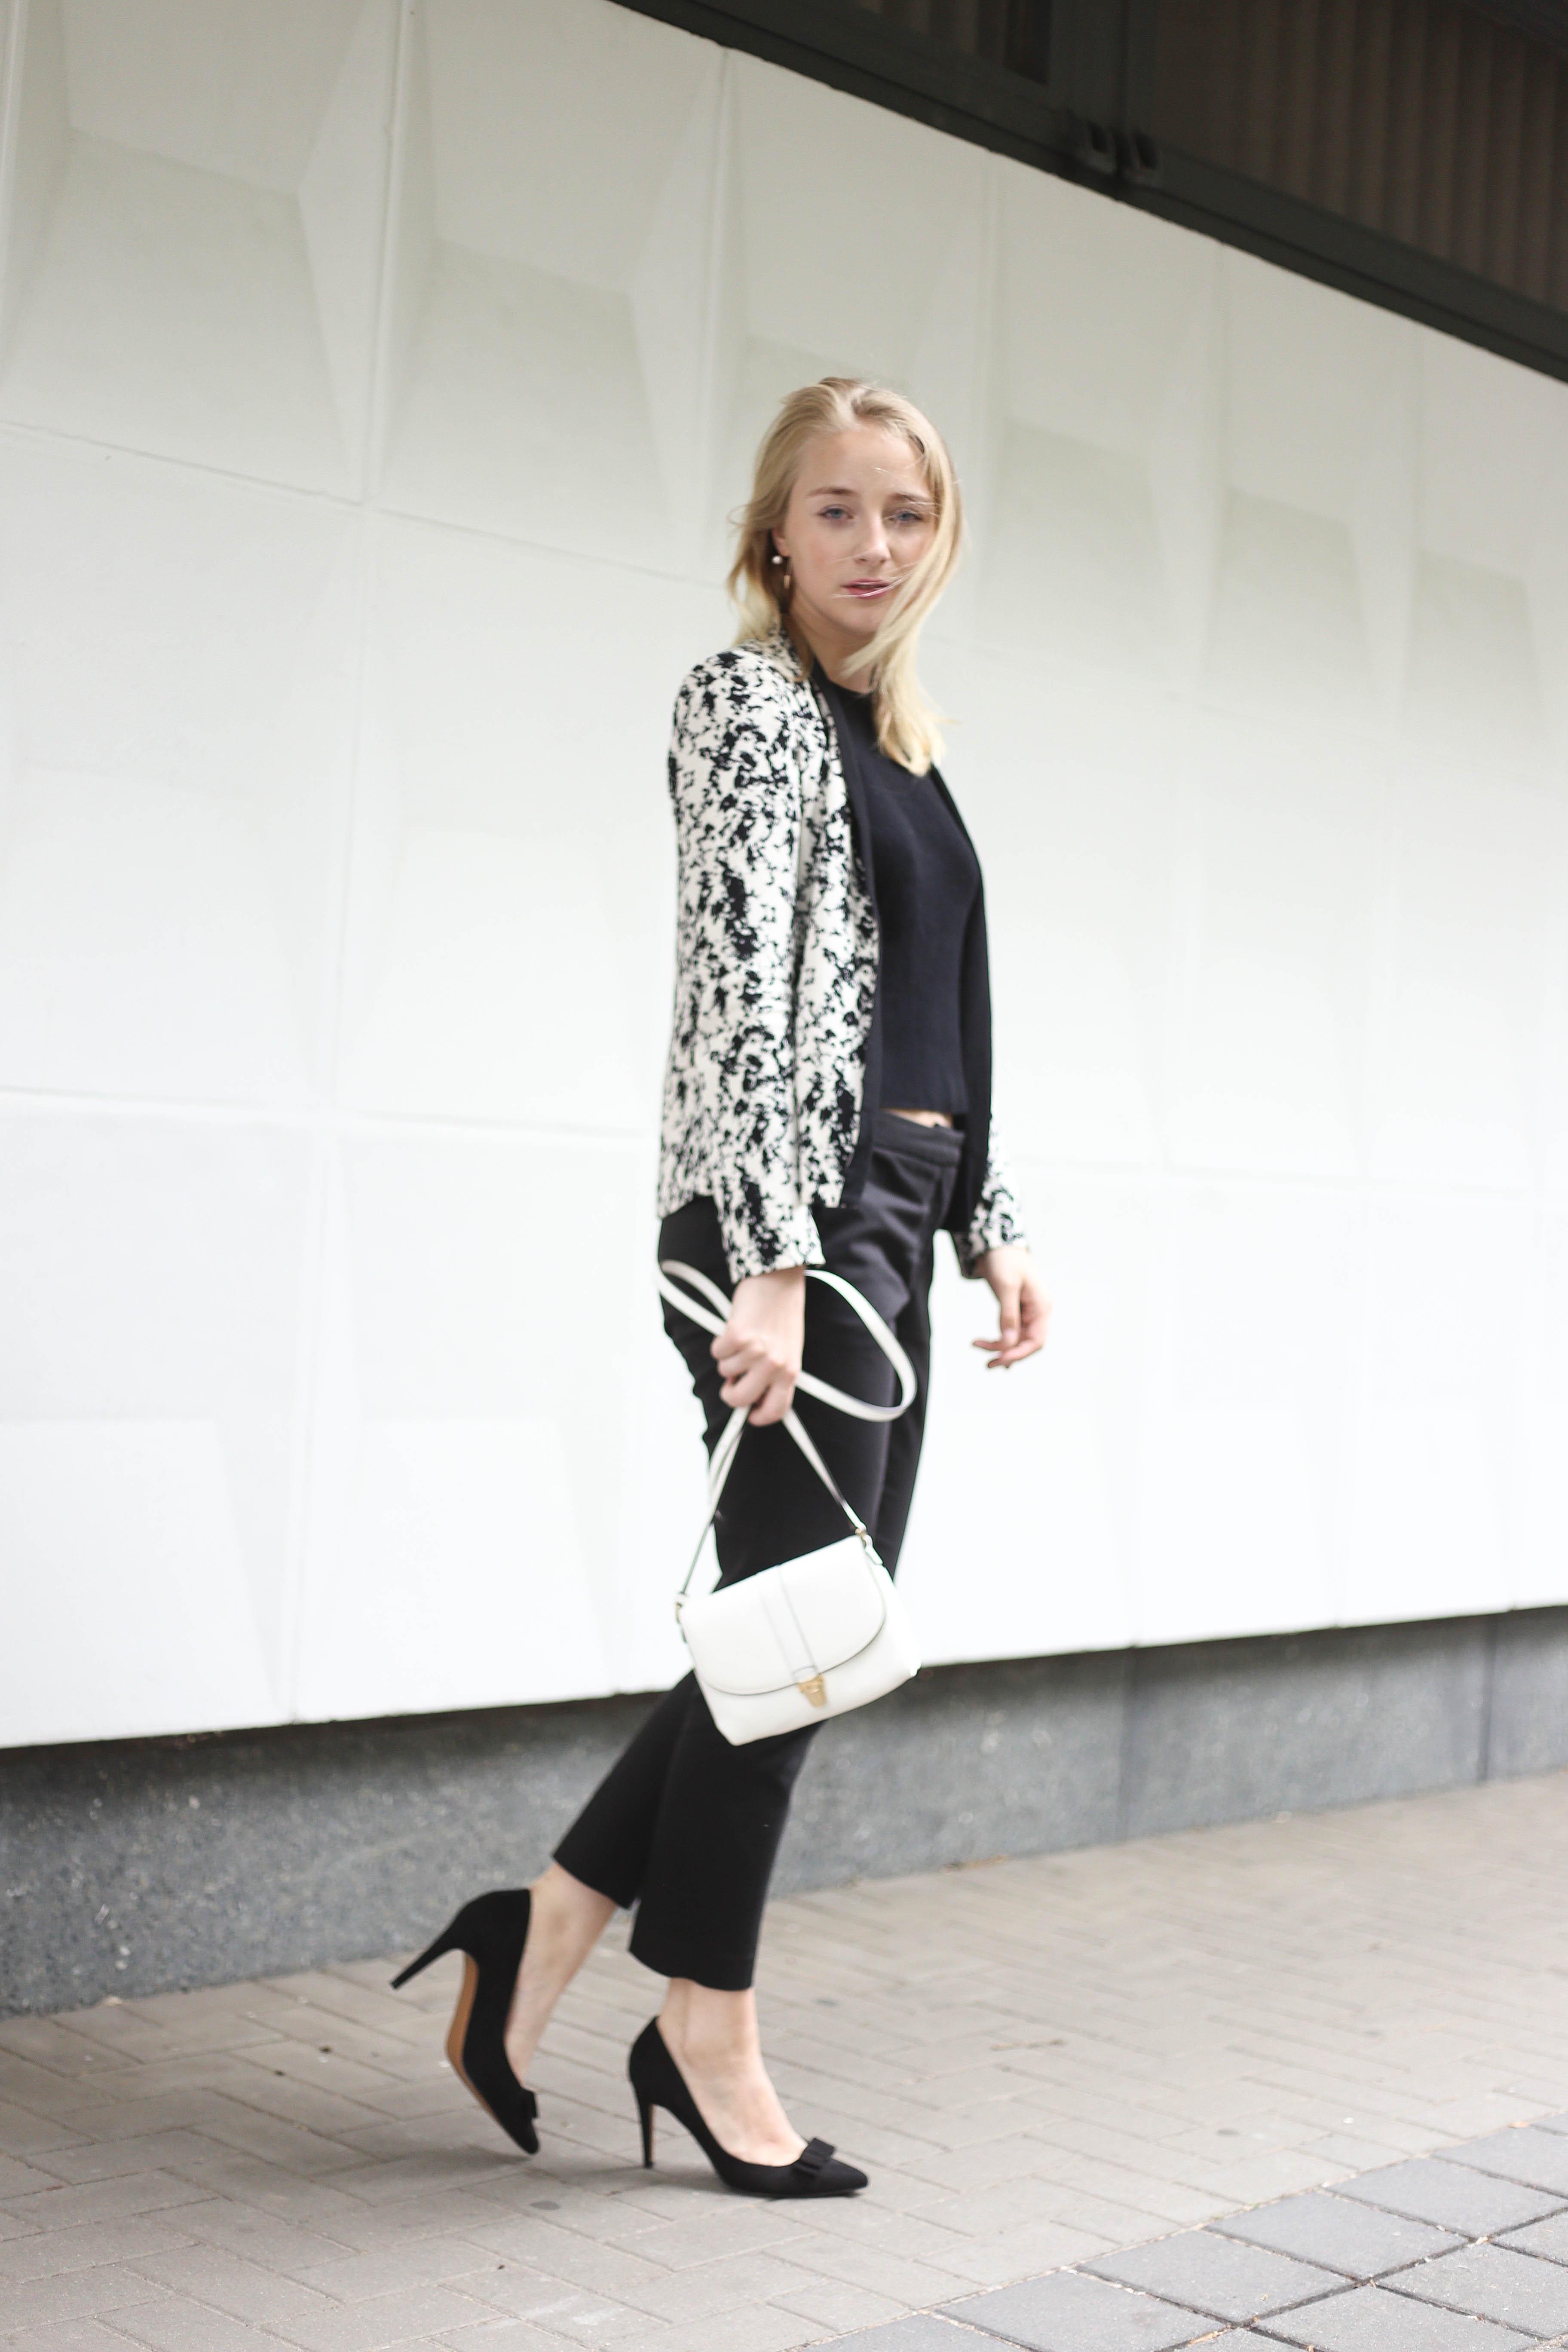 anzugshose-alltag-dalmatiner-blazer-outfit-fashionblog-berlin-köln_2075